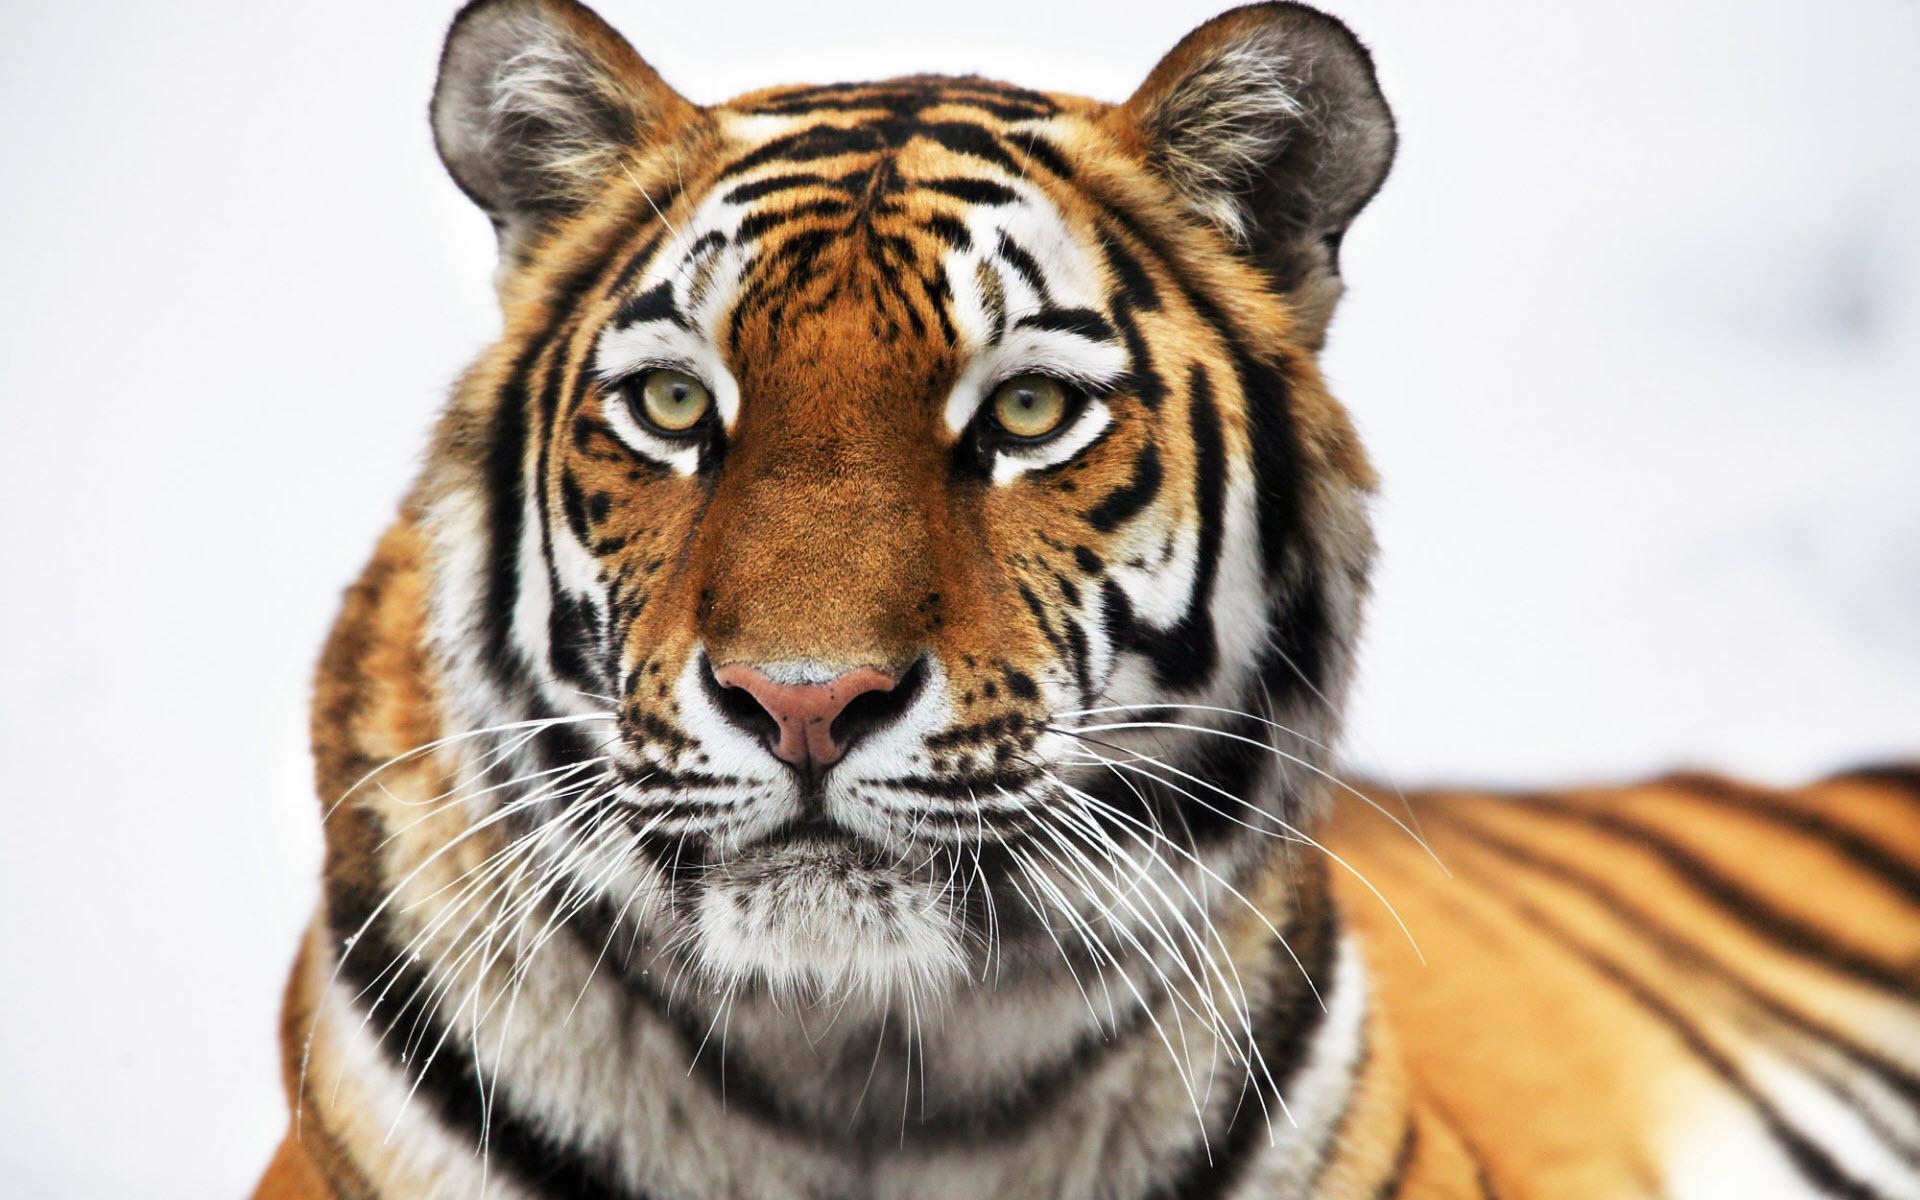 tiger wallpaper widescreen - photo #17